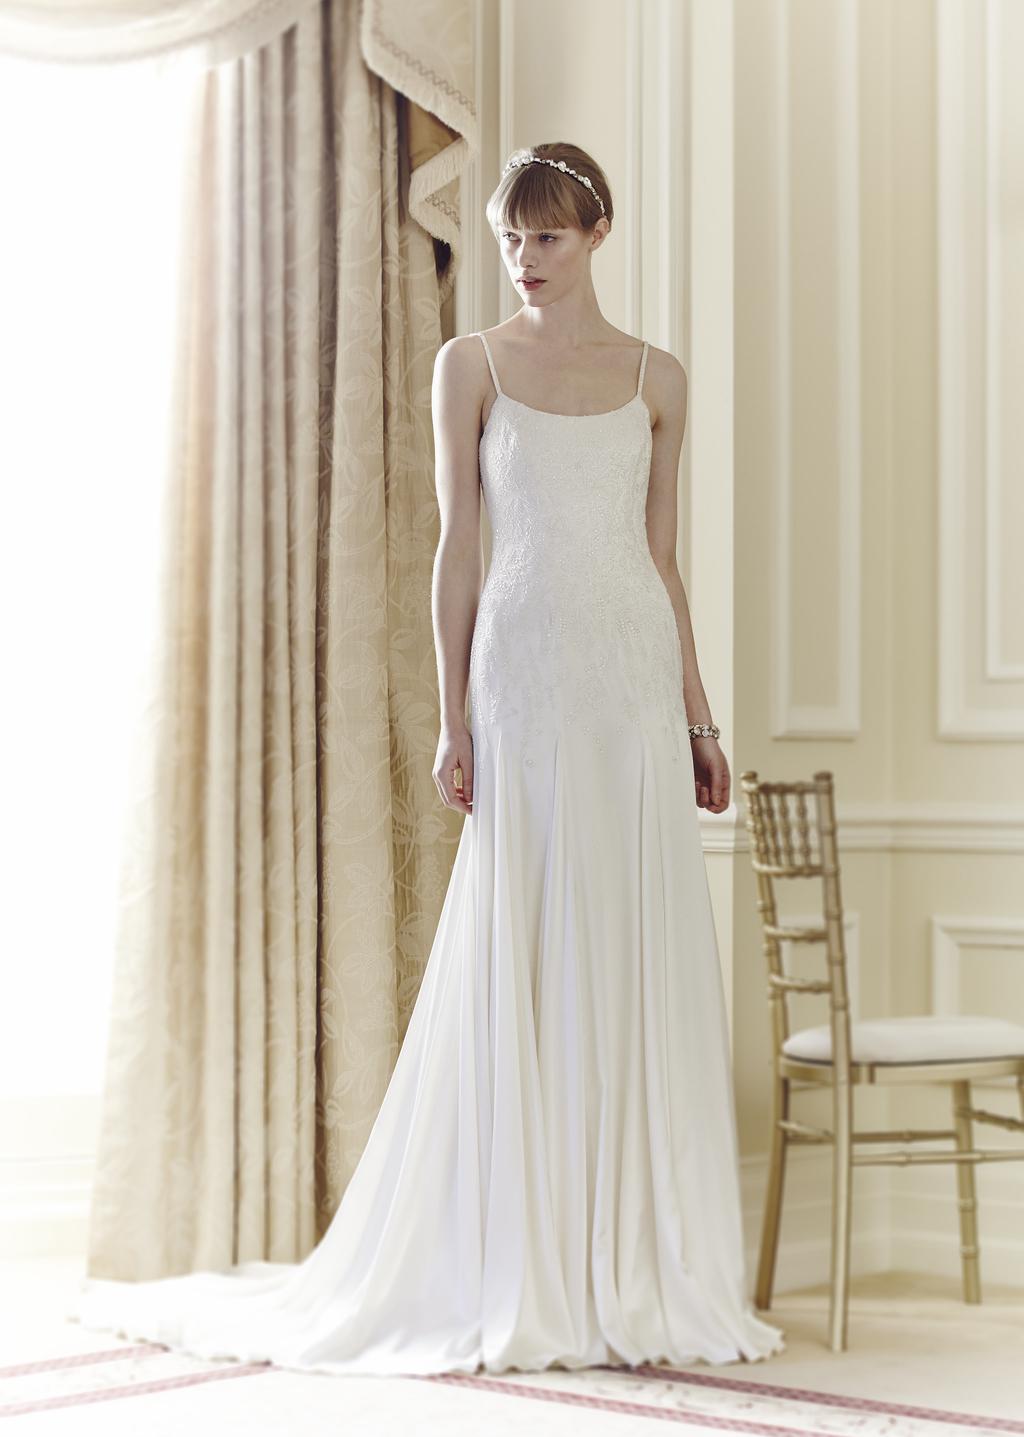 Jenny-packham-bridal-collection-spring-summer-2014-taylor.full